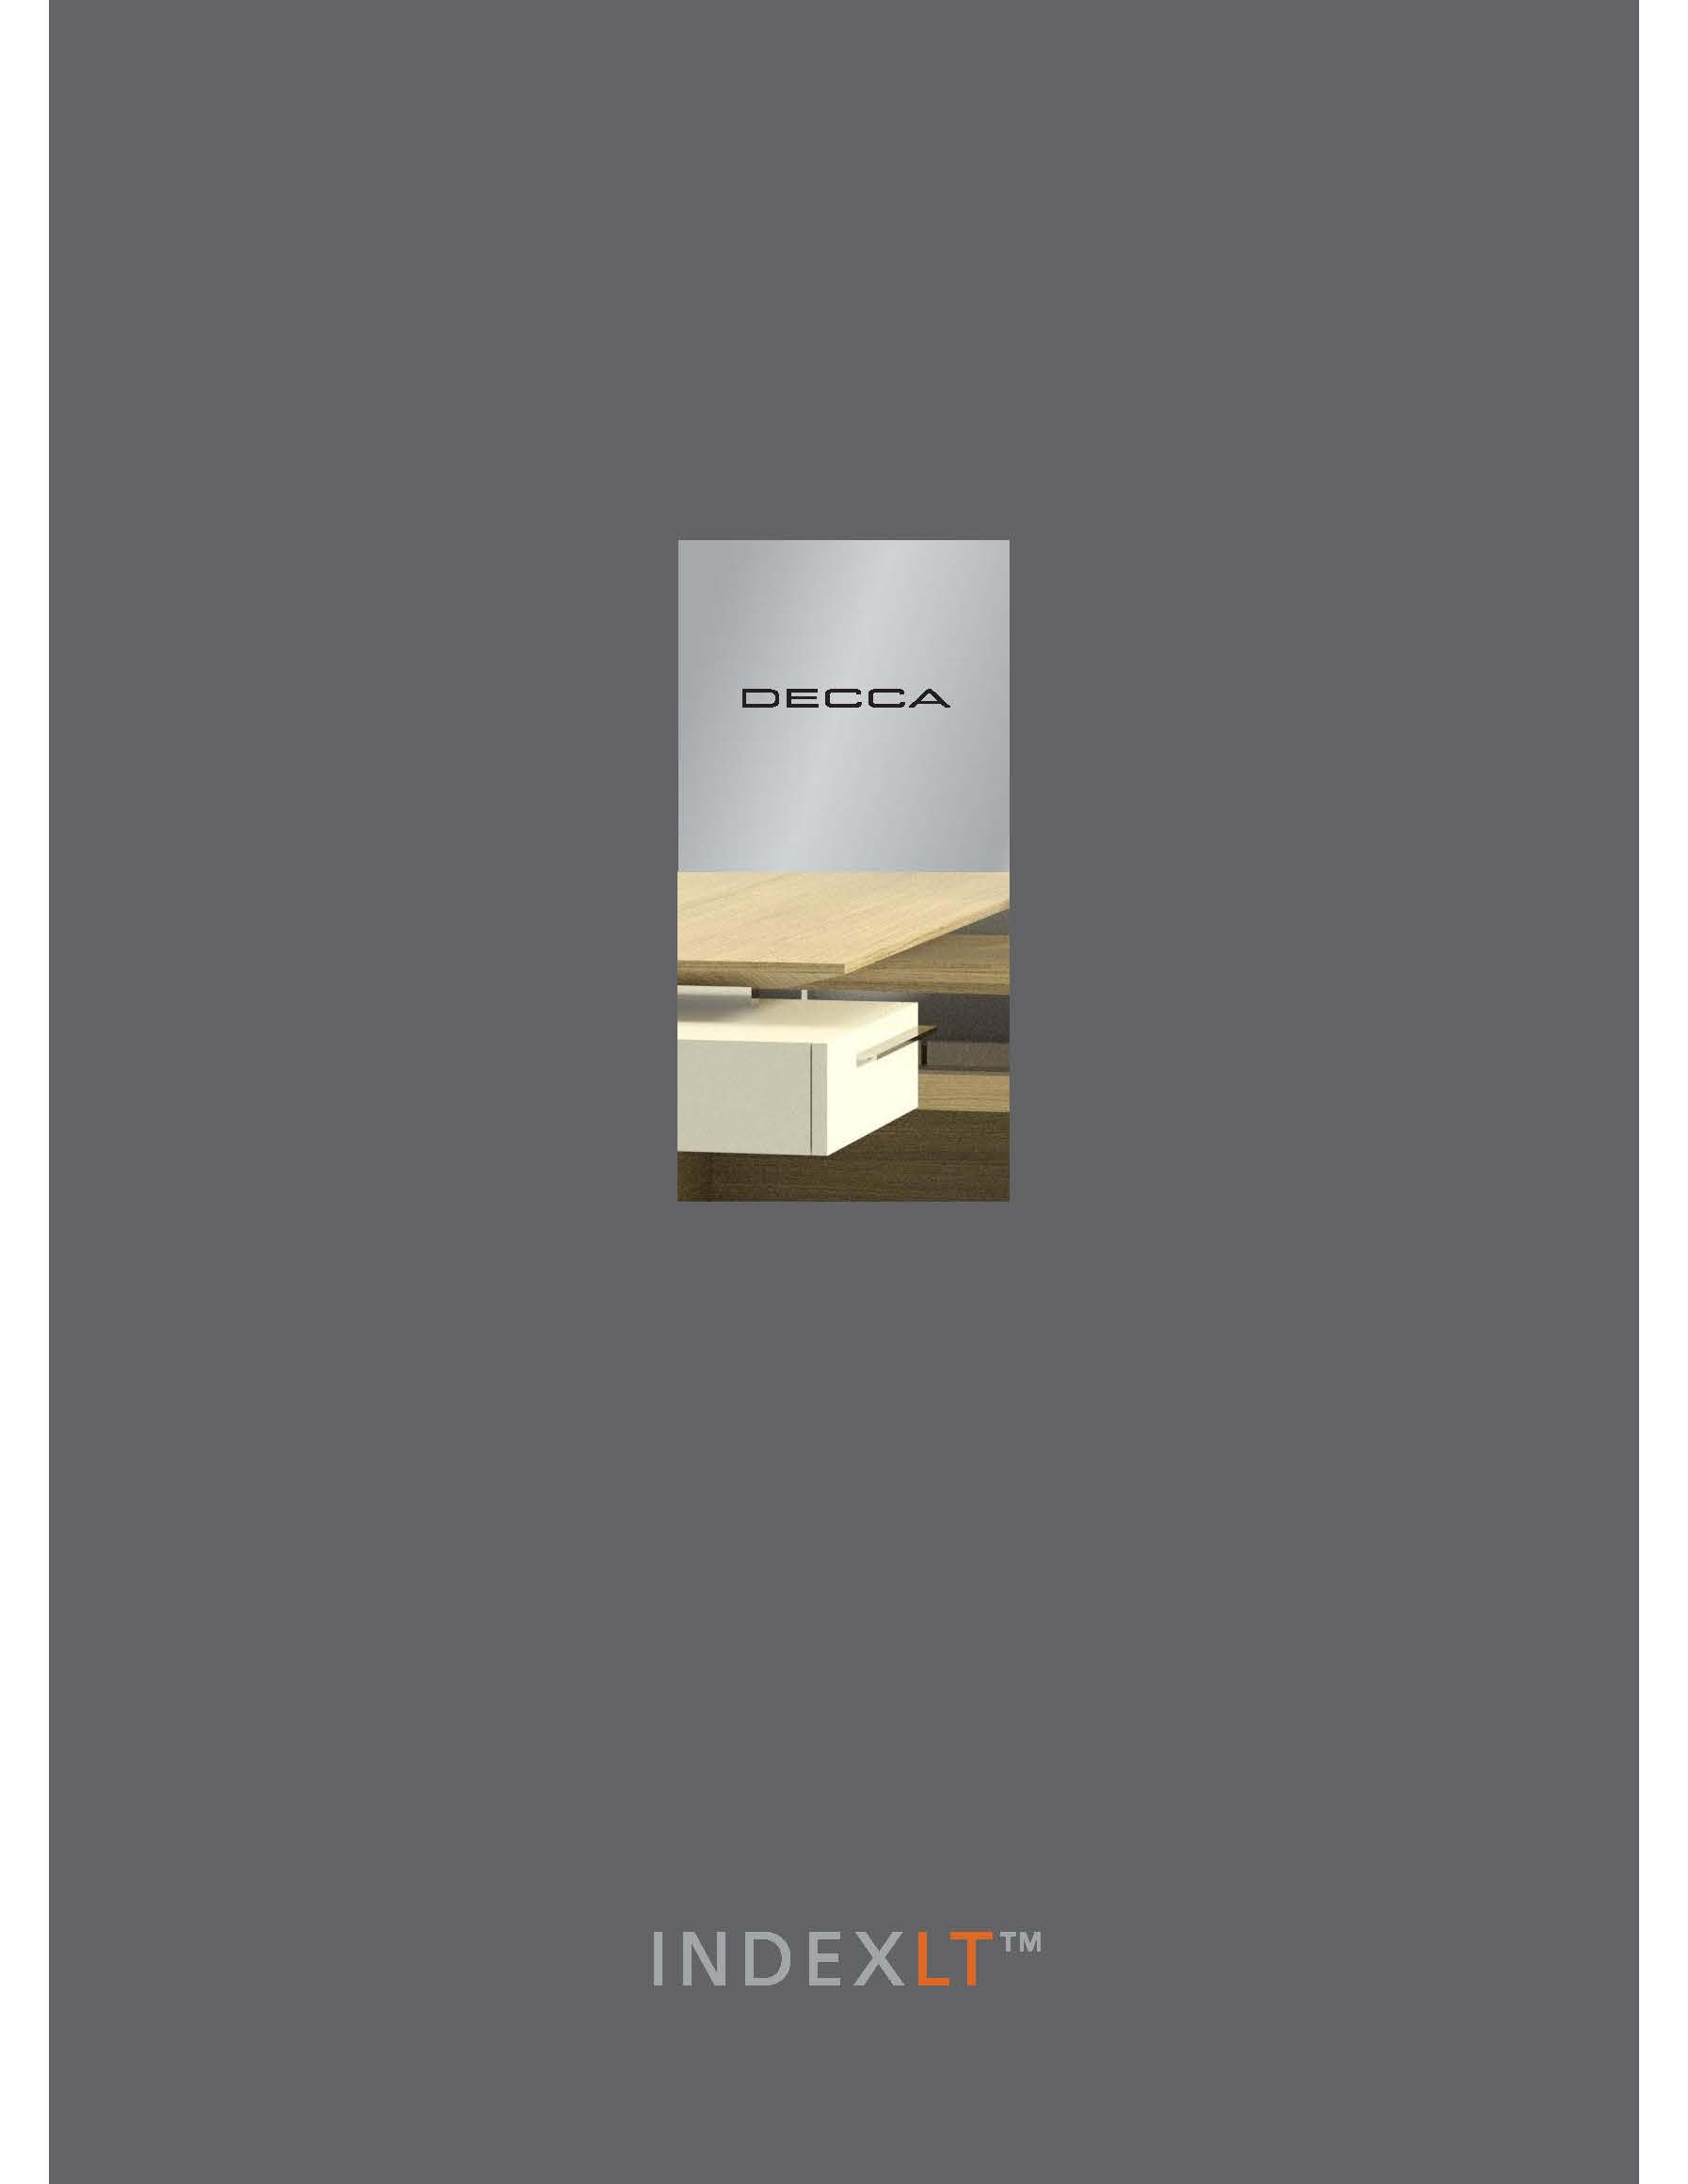 Decca Catalog_IndexLT Cover